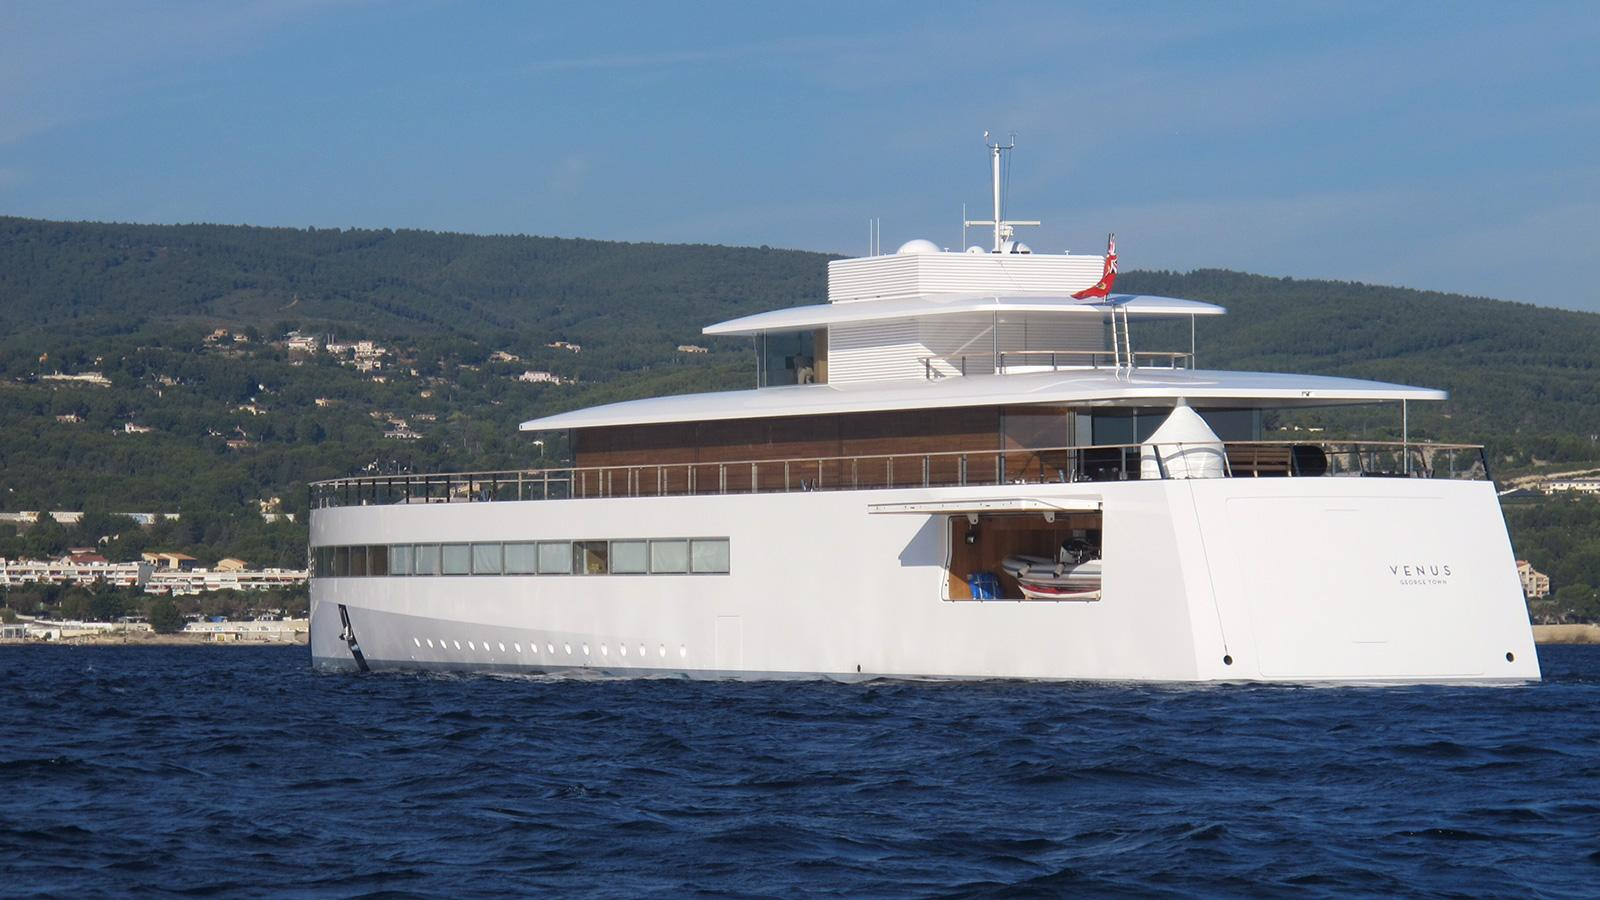 Steve Jobs superyacht Venus garage